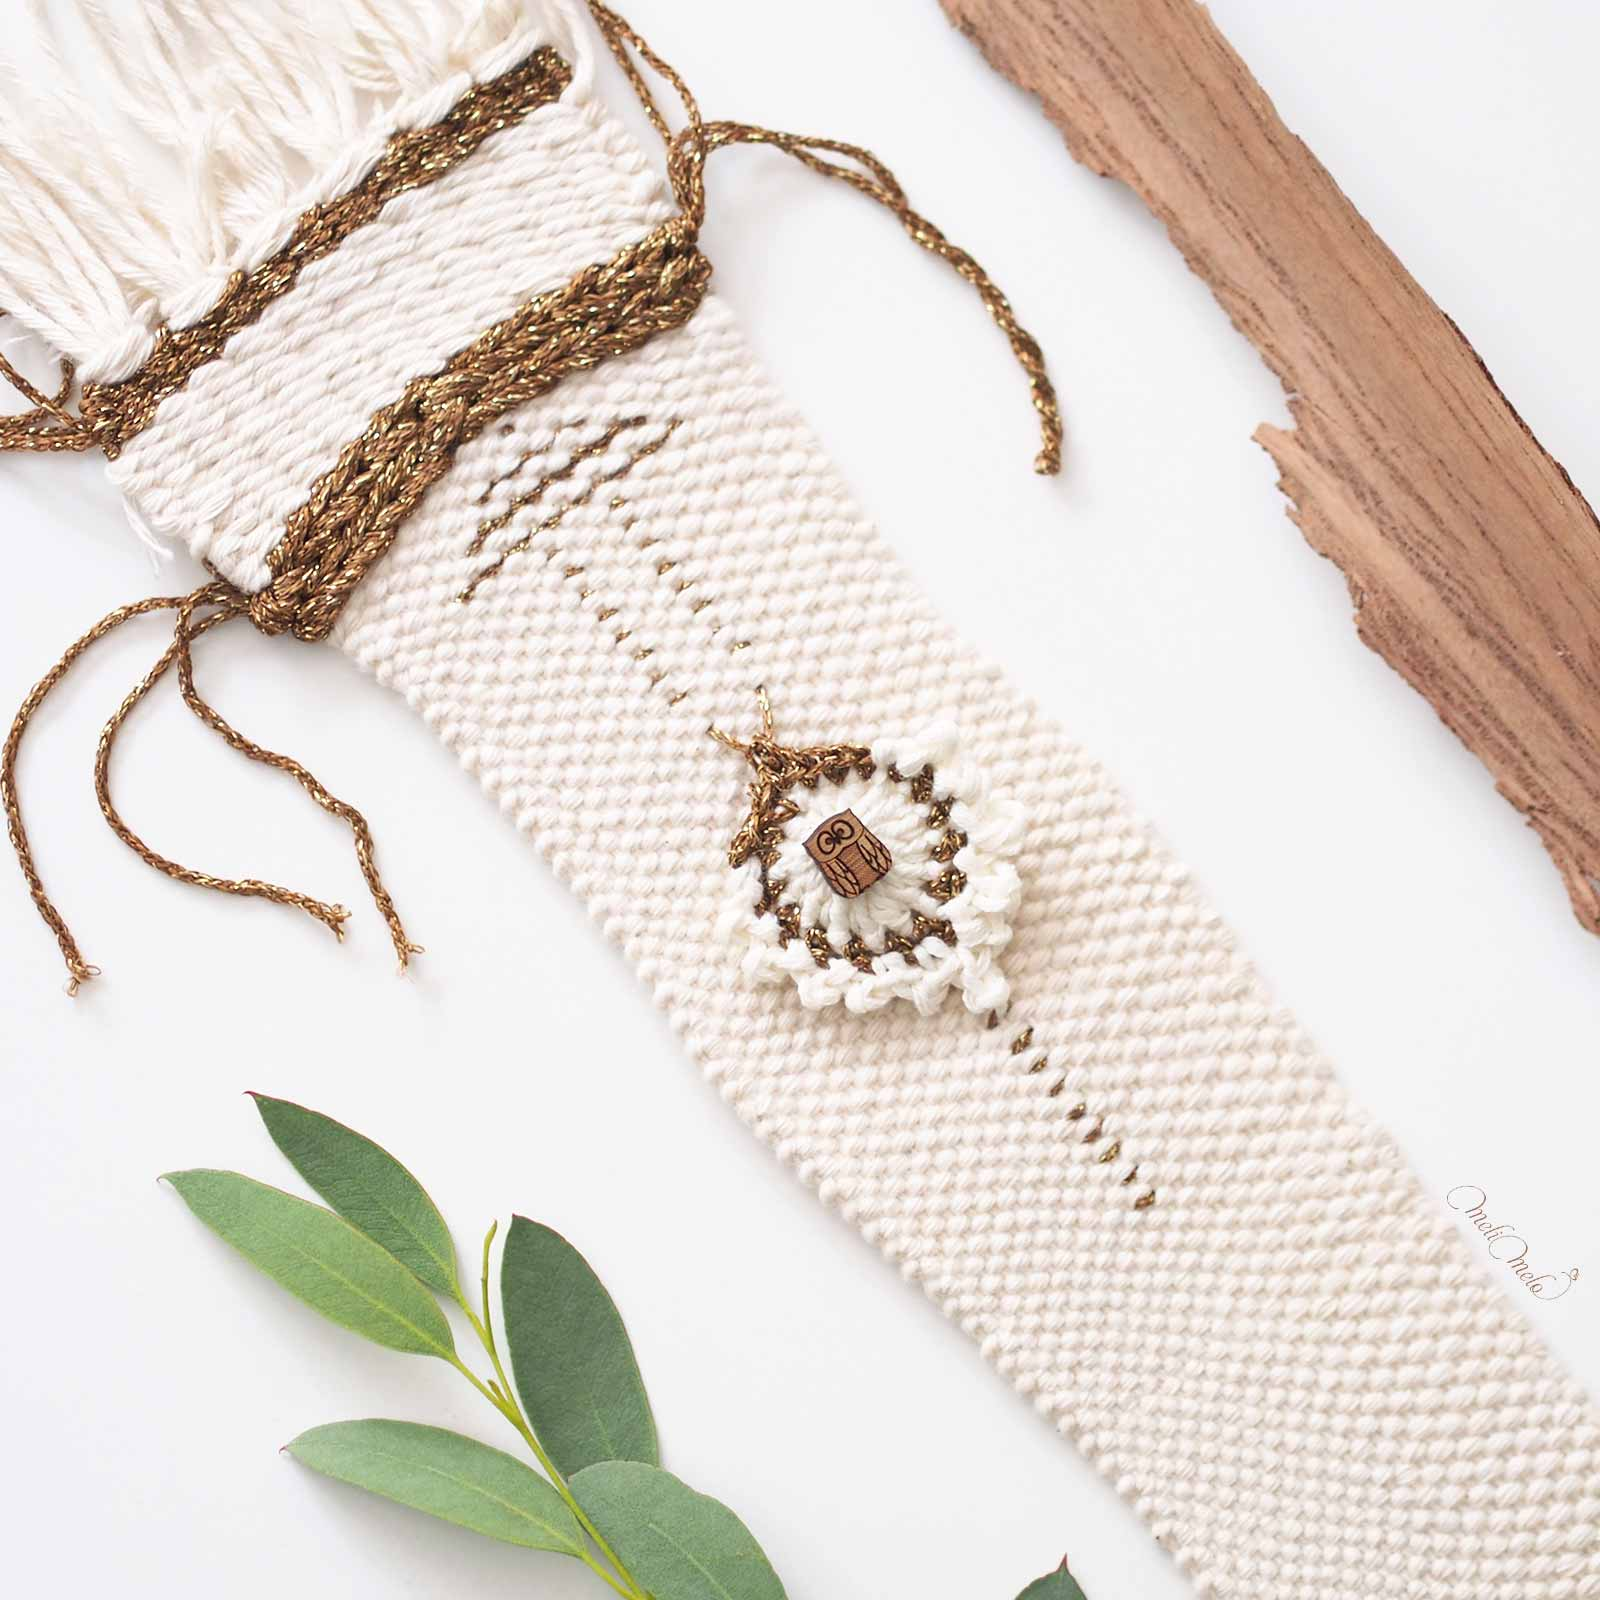 tissage coton or chouette eucalyptus peacock crochet laboutiquedemelimelo